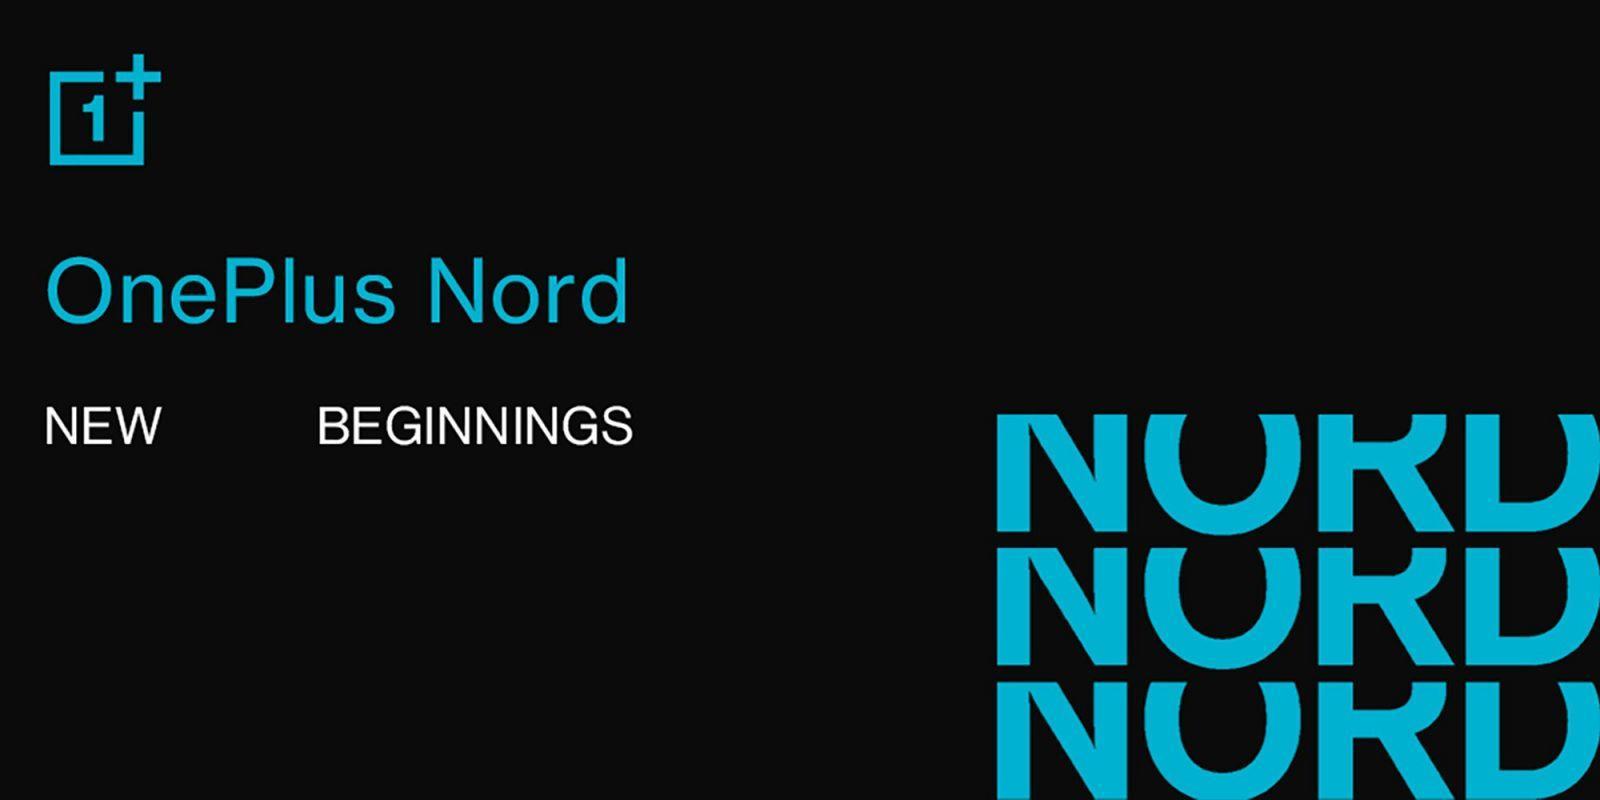 Подтверждено: OnePlus Nord получит Snapdragon 765G (oneplus nord qualcomm snapdragon 765g)